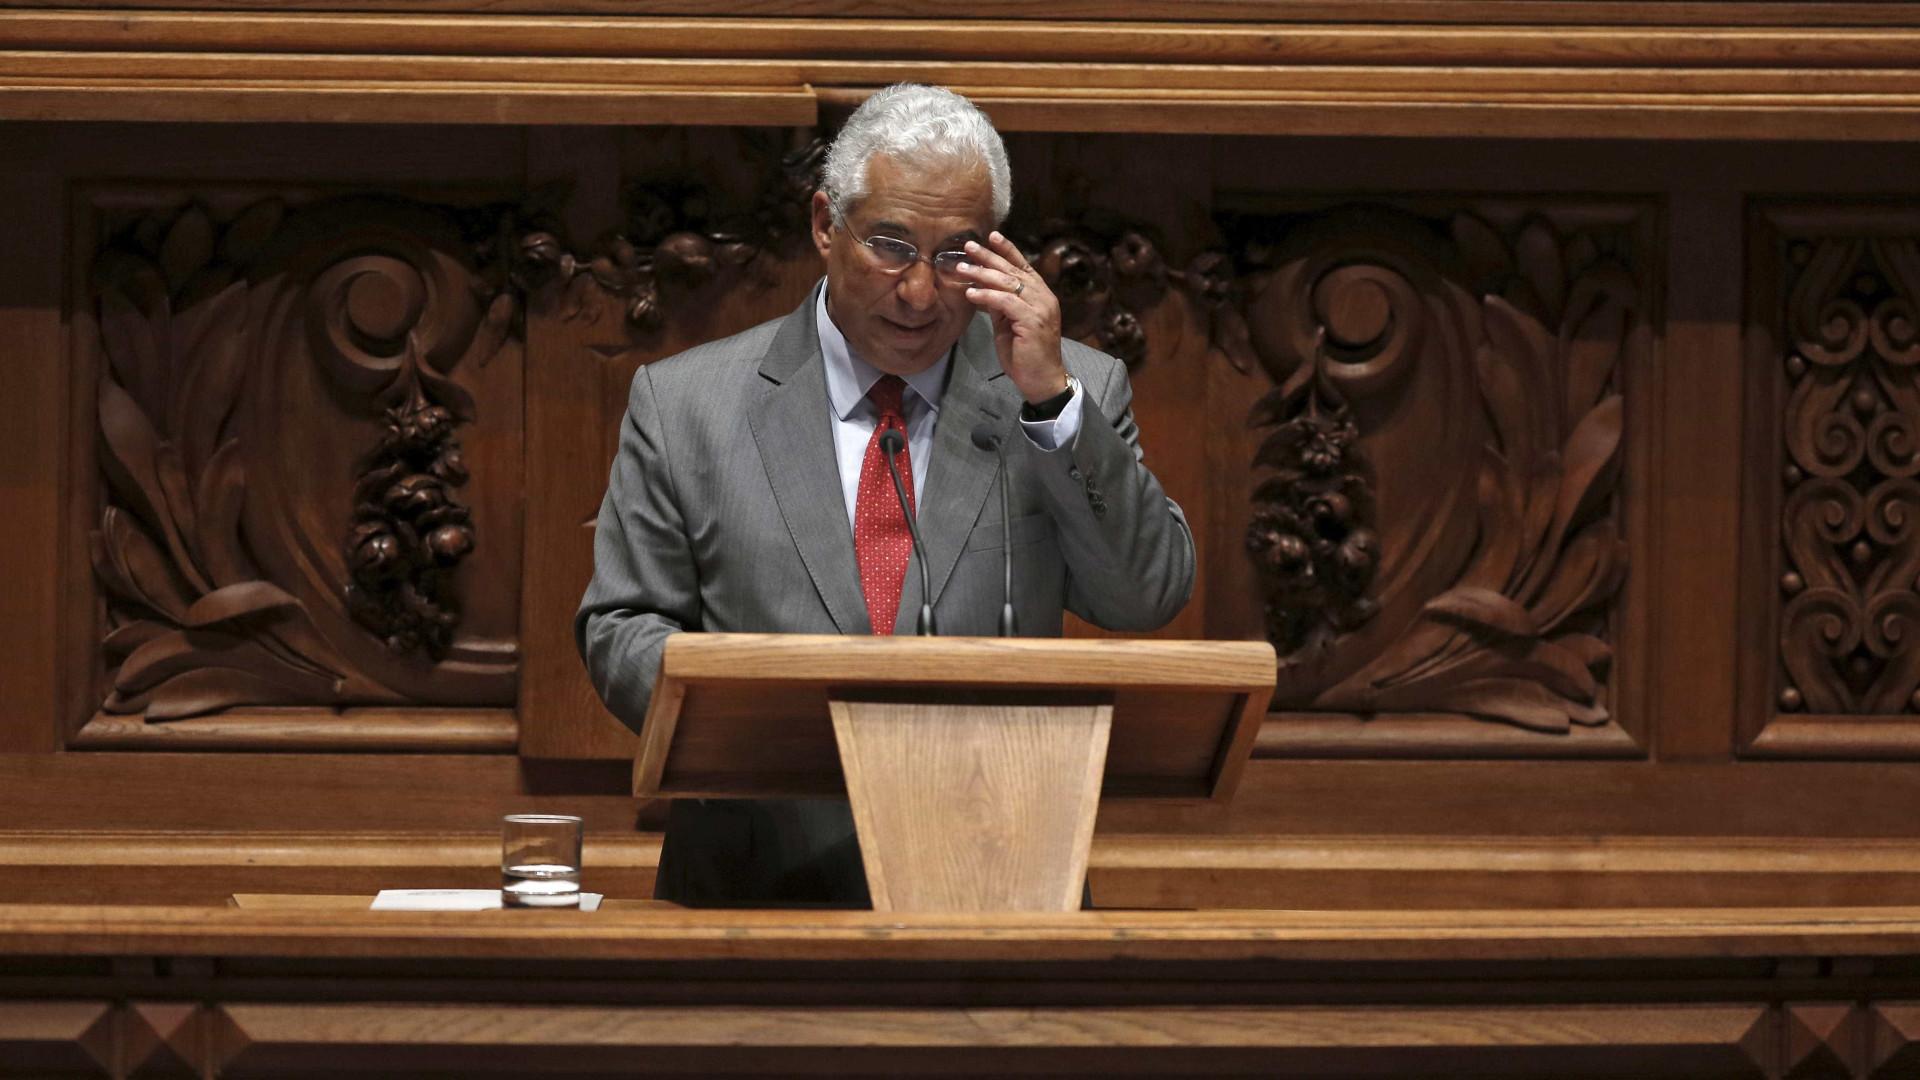 Costa nega ter dado ordens ao PS para mudar sentido de voto